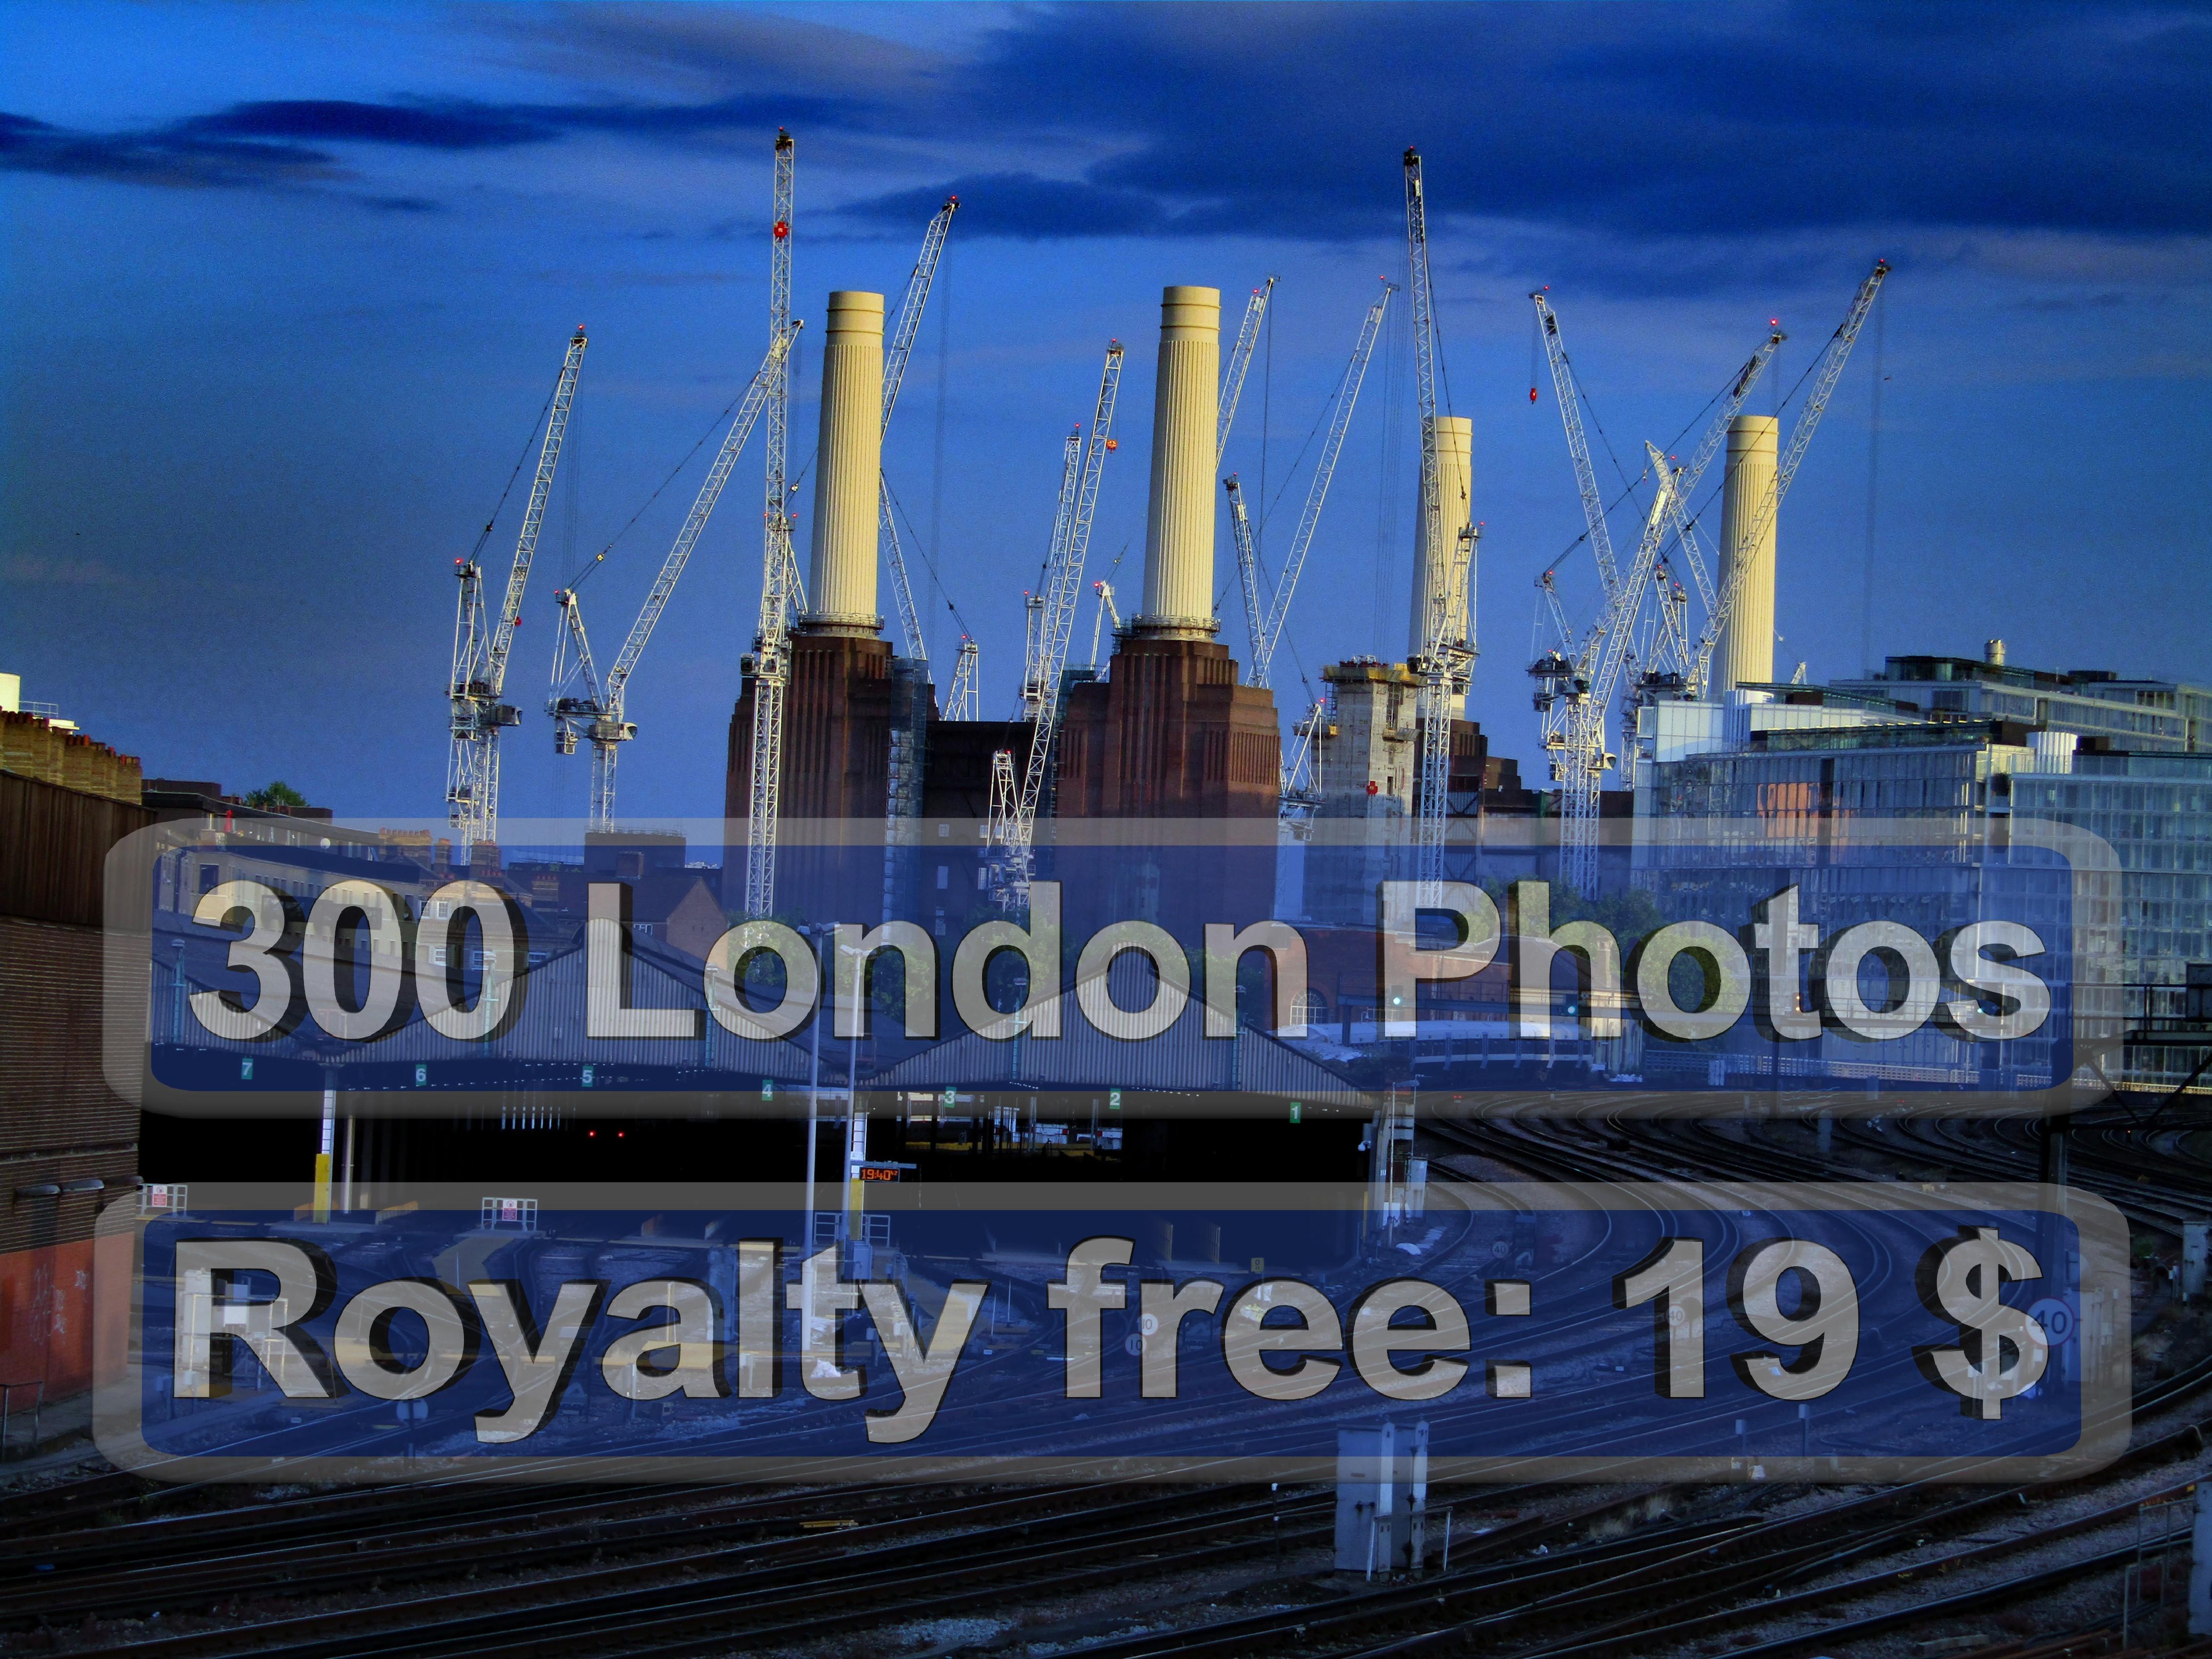 London Drugs Photo Quality